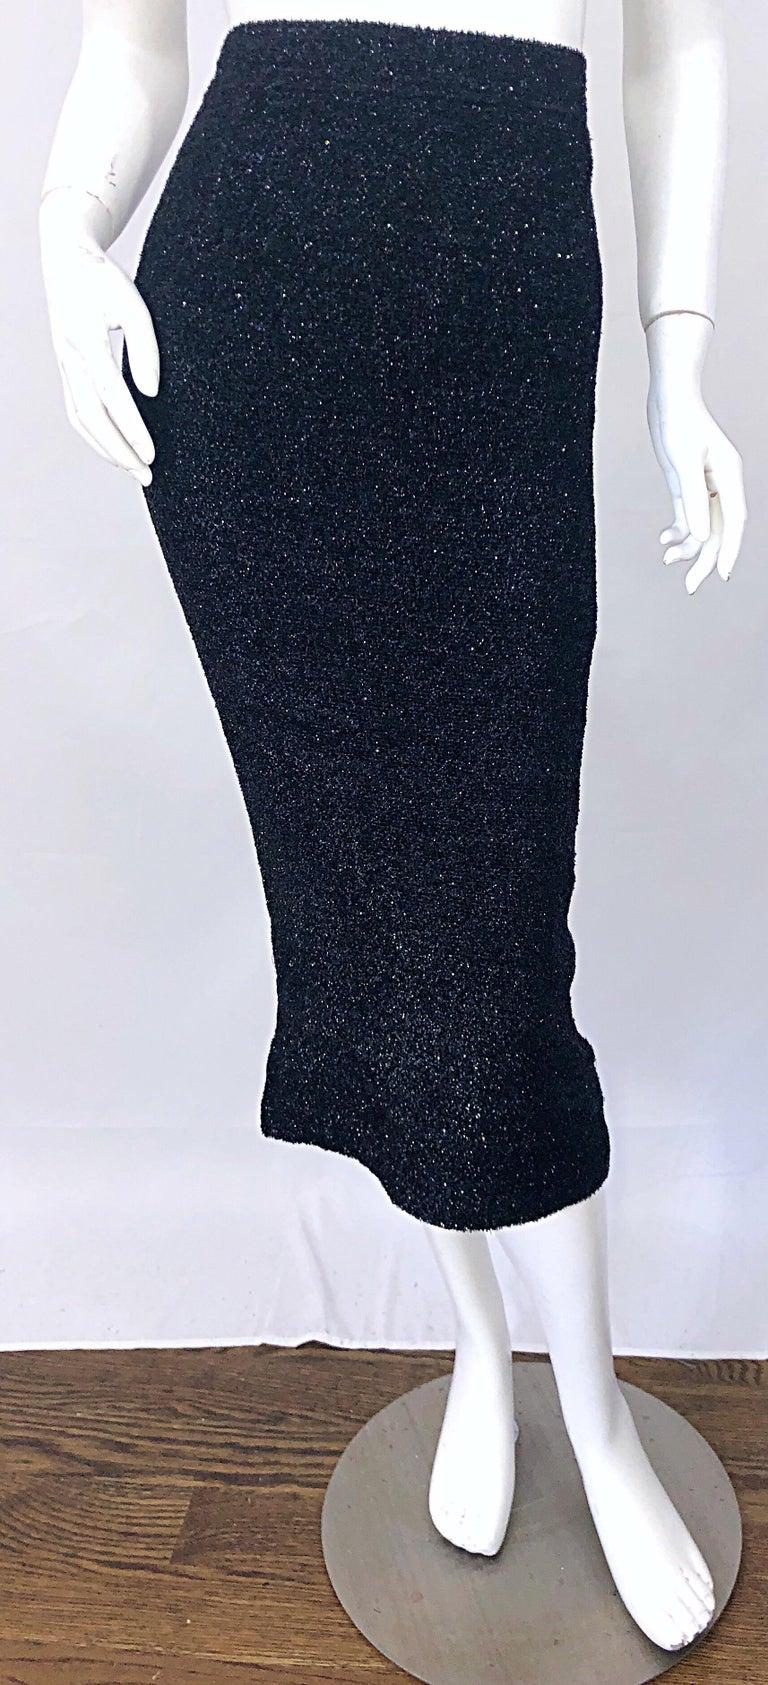 Vintage Christian Lacroix Sz 10 / 12 Black Silk Lurex High Waist 90s Midi Skirt For Sale 7